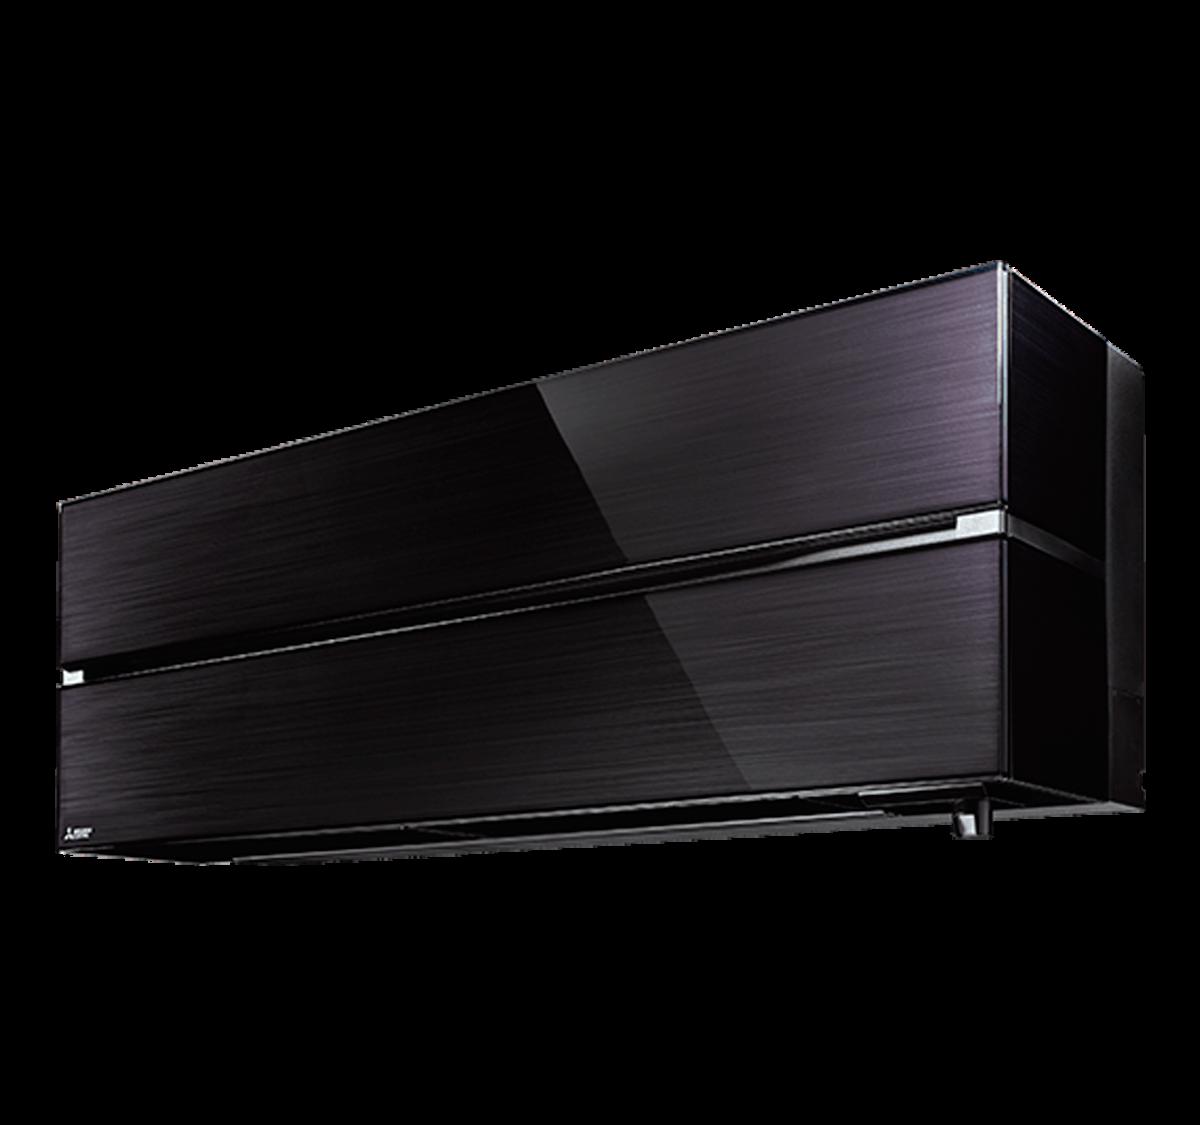 aire acondicionado unidad interior mitsubishi electric inverter msz ln35vgb serie kirigamine style modelo msz ln35vgb precio incluido instalacion caseragua 02